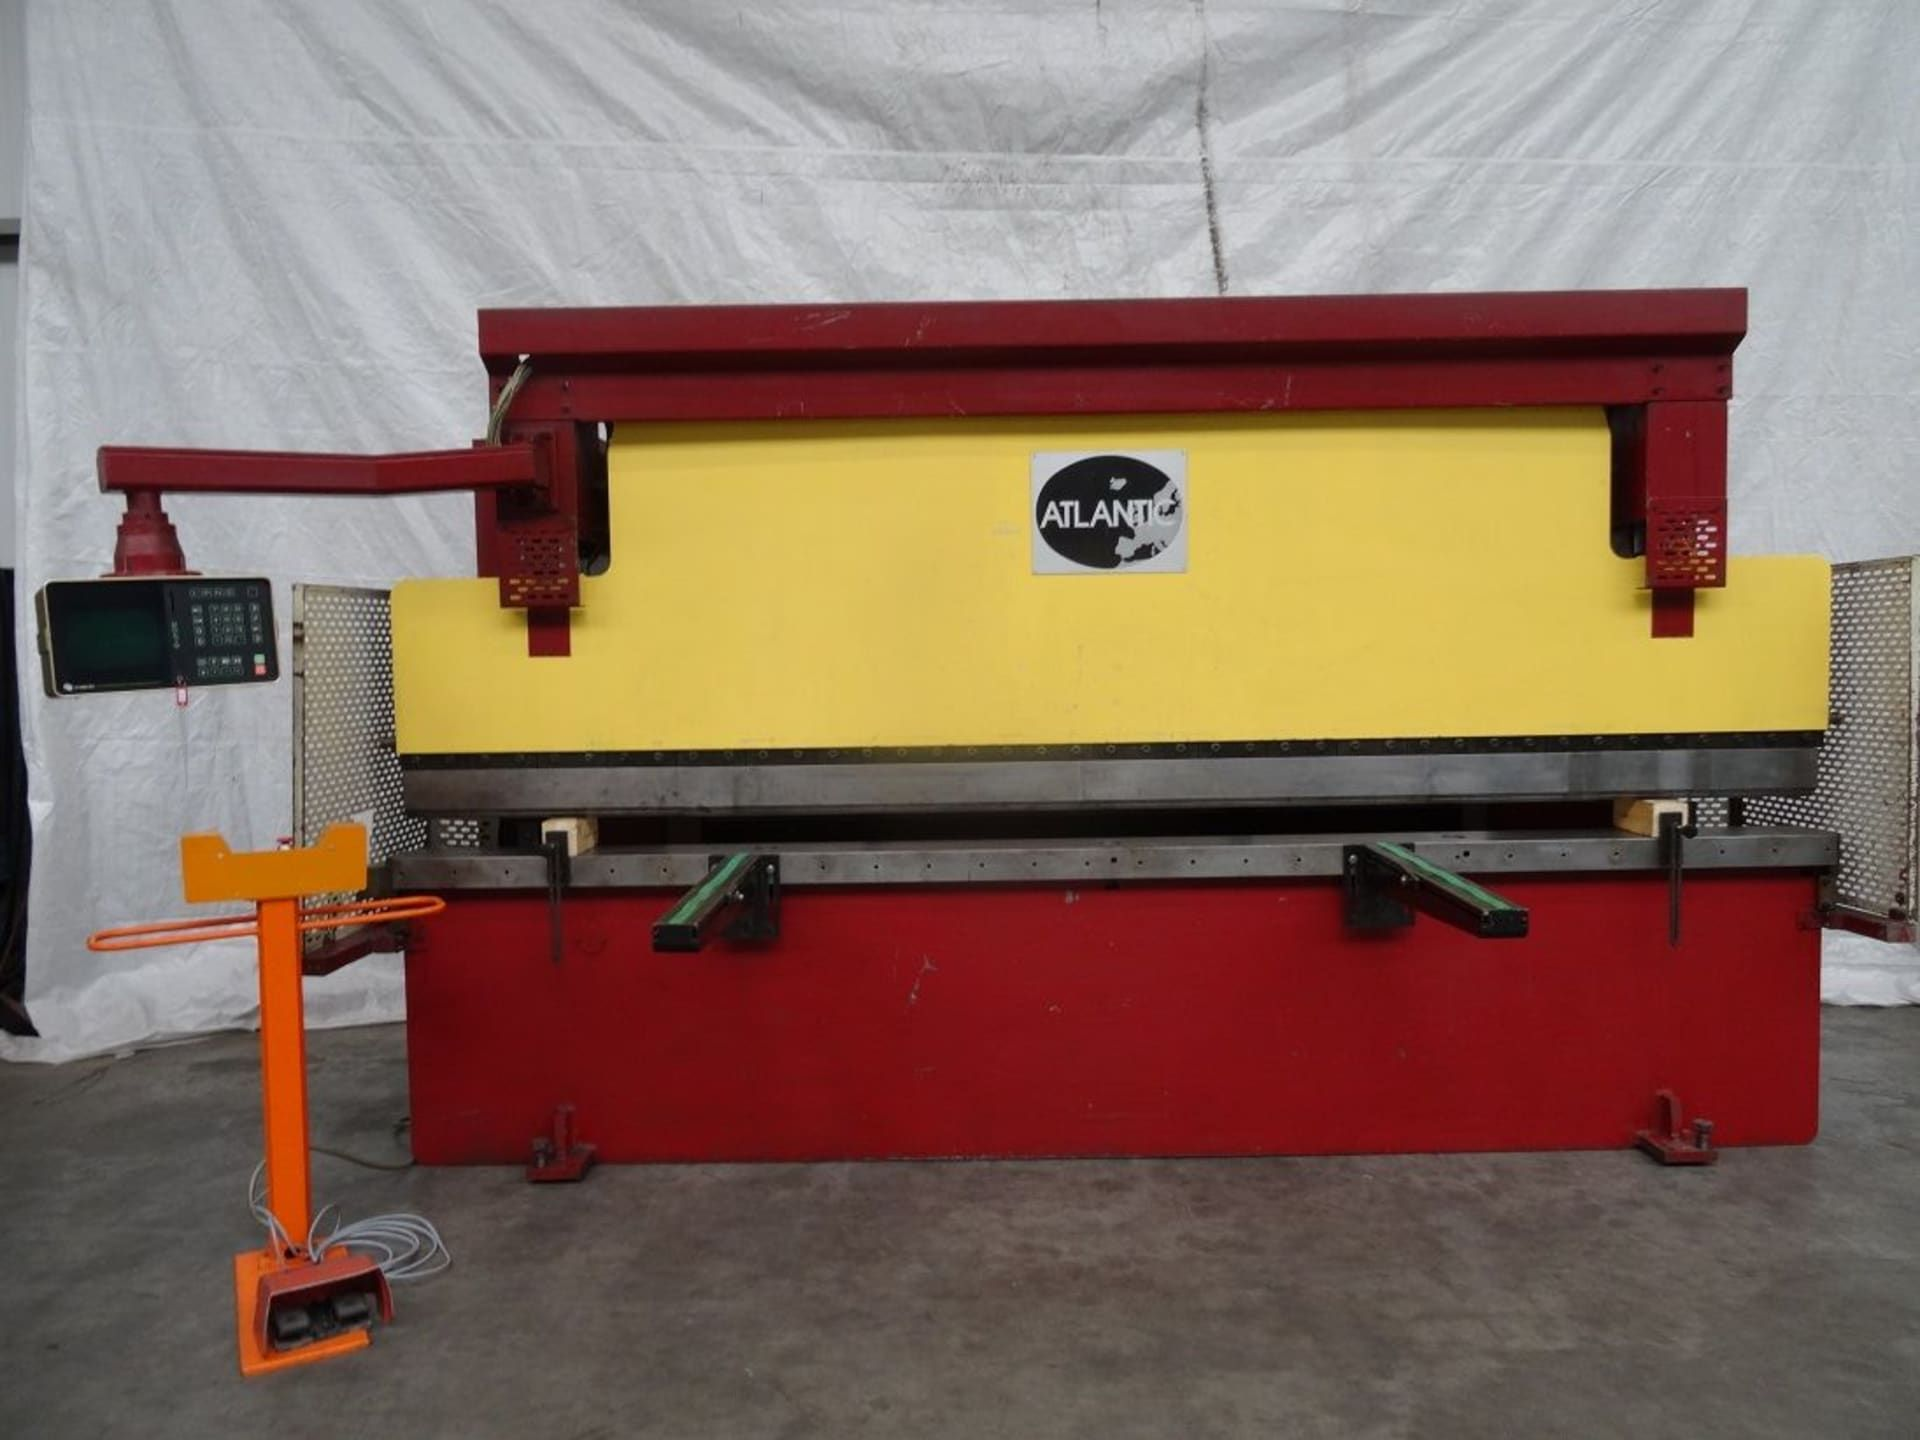 ATLANTIC HPE 40135 CNC Abkantpresse